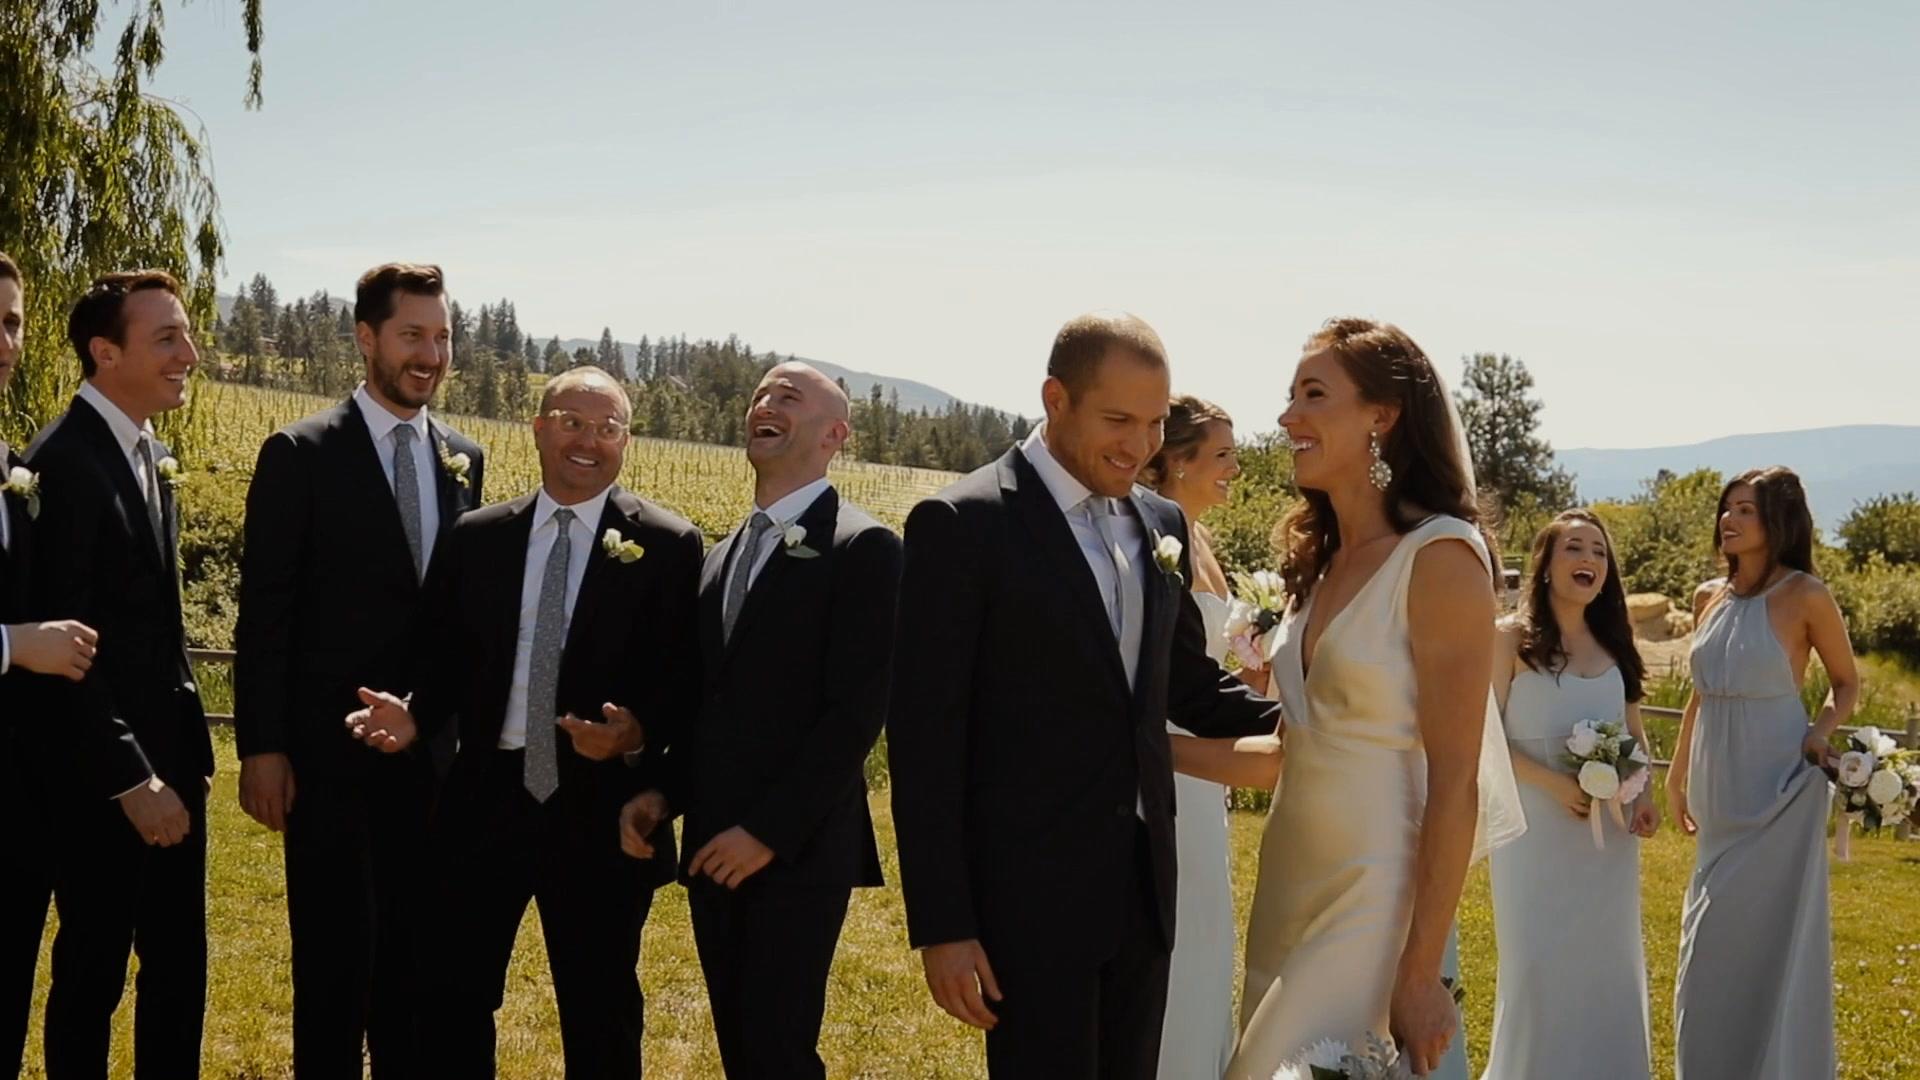 Nicole + Michael | Kelowna, Canada | Summerhill Pyramid Winery